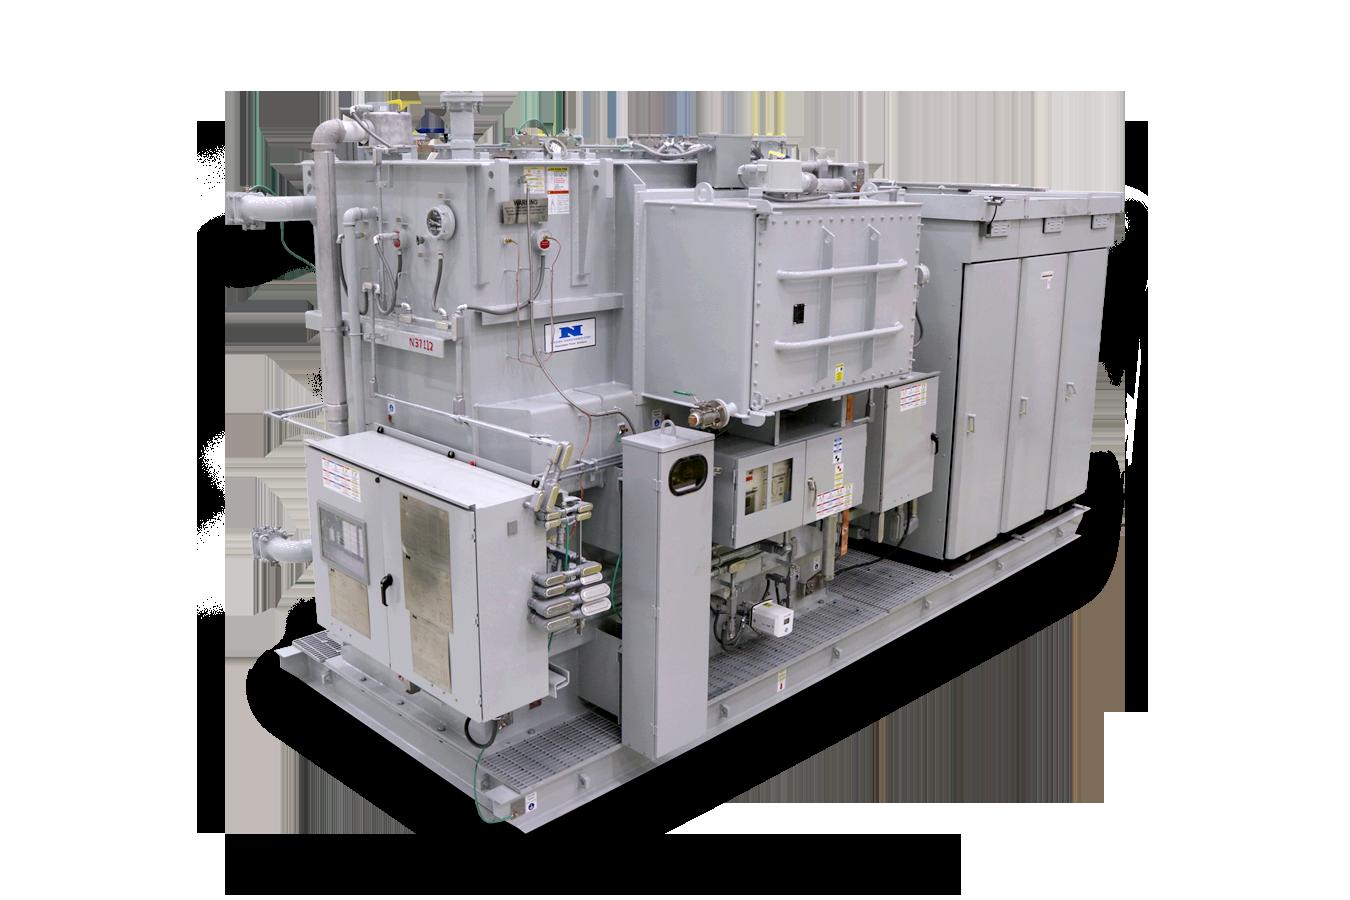 Skid Mount Power Transformer - Niagara Power Transformer